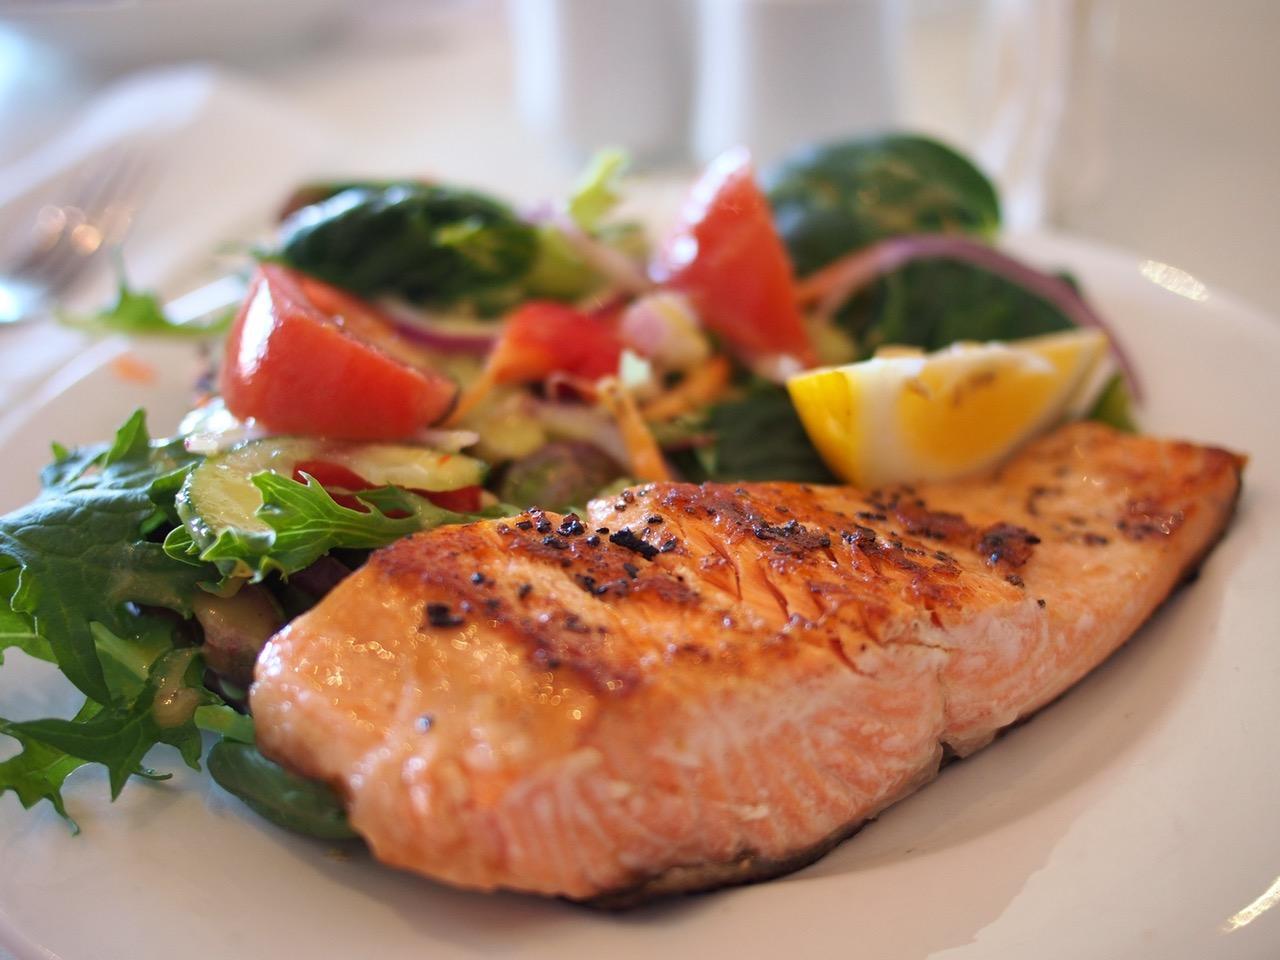 salmon-dish-food-meal-46239-1495487013882.jpeg